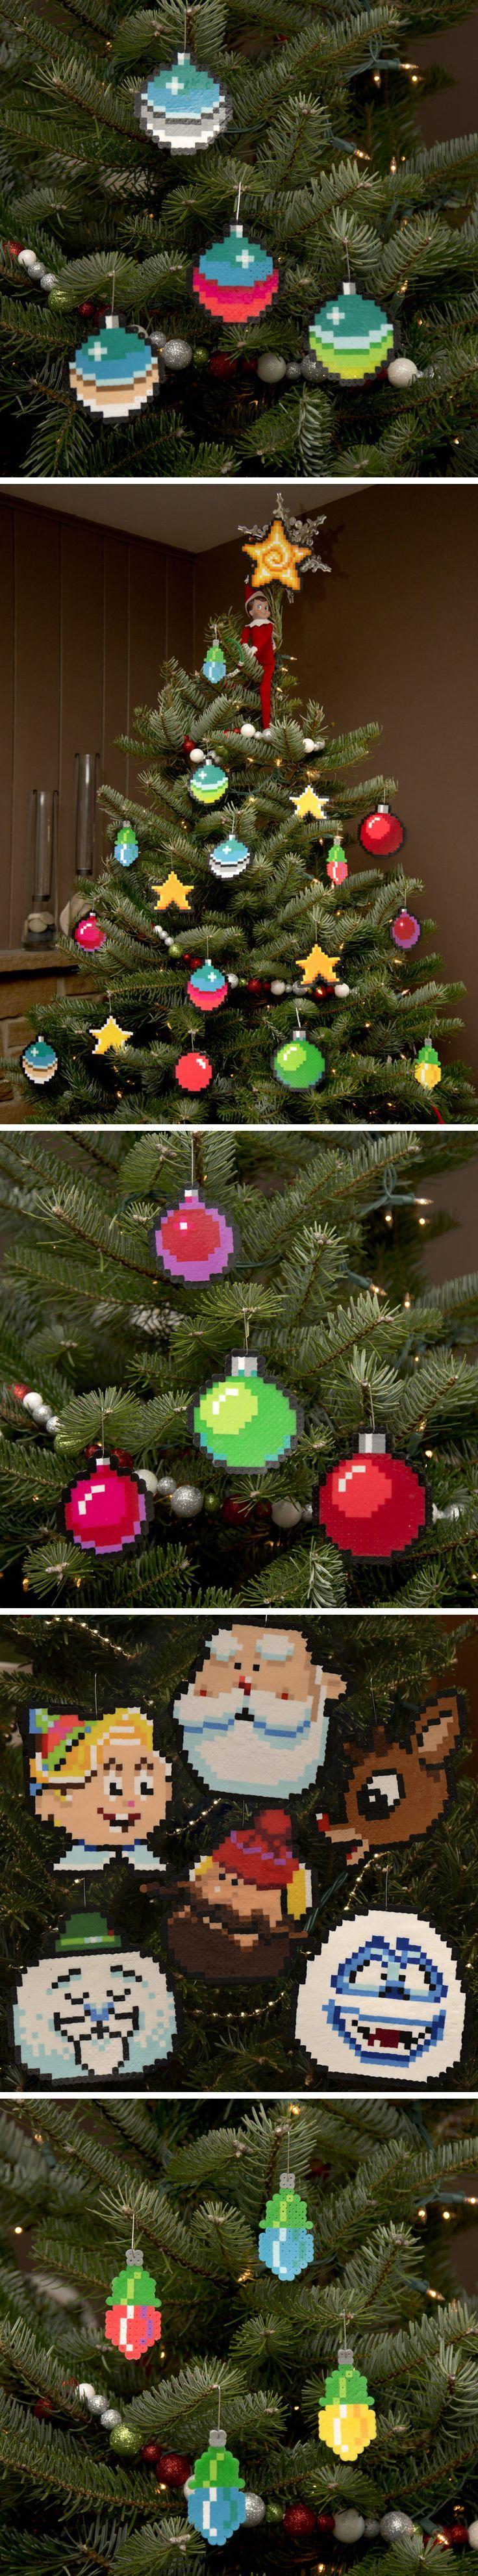 Chrome 8 bit Pixel Ornaments (Pixel Art Christmas Lights)